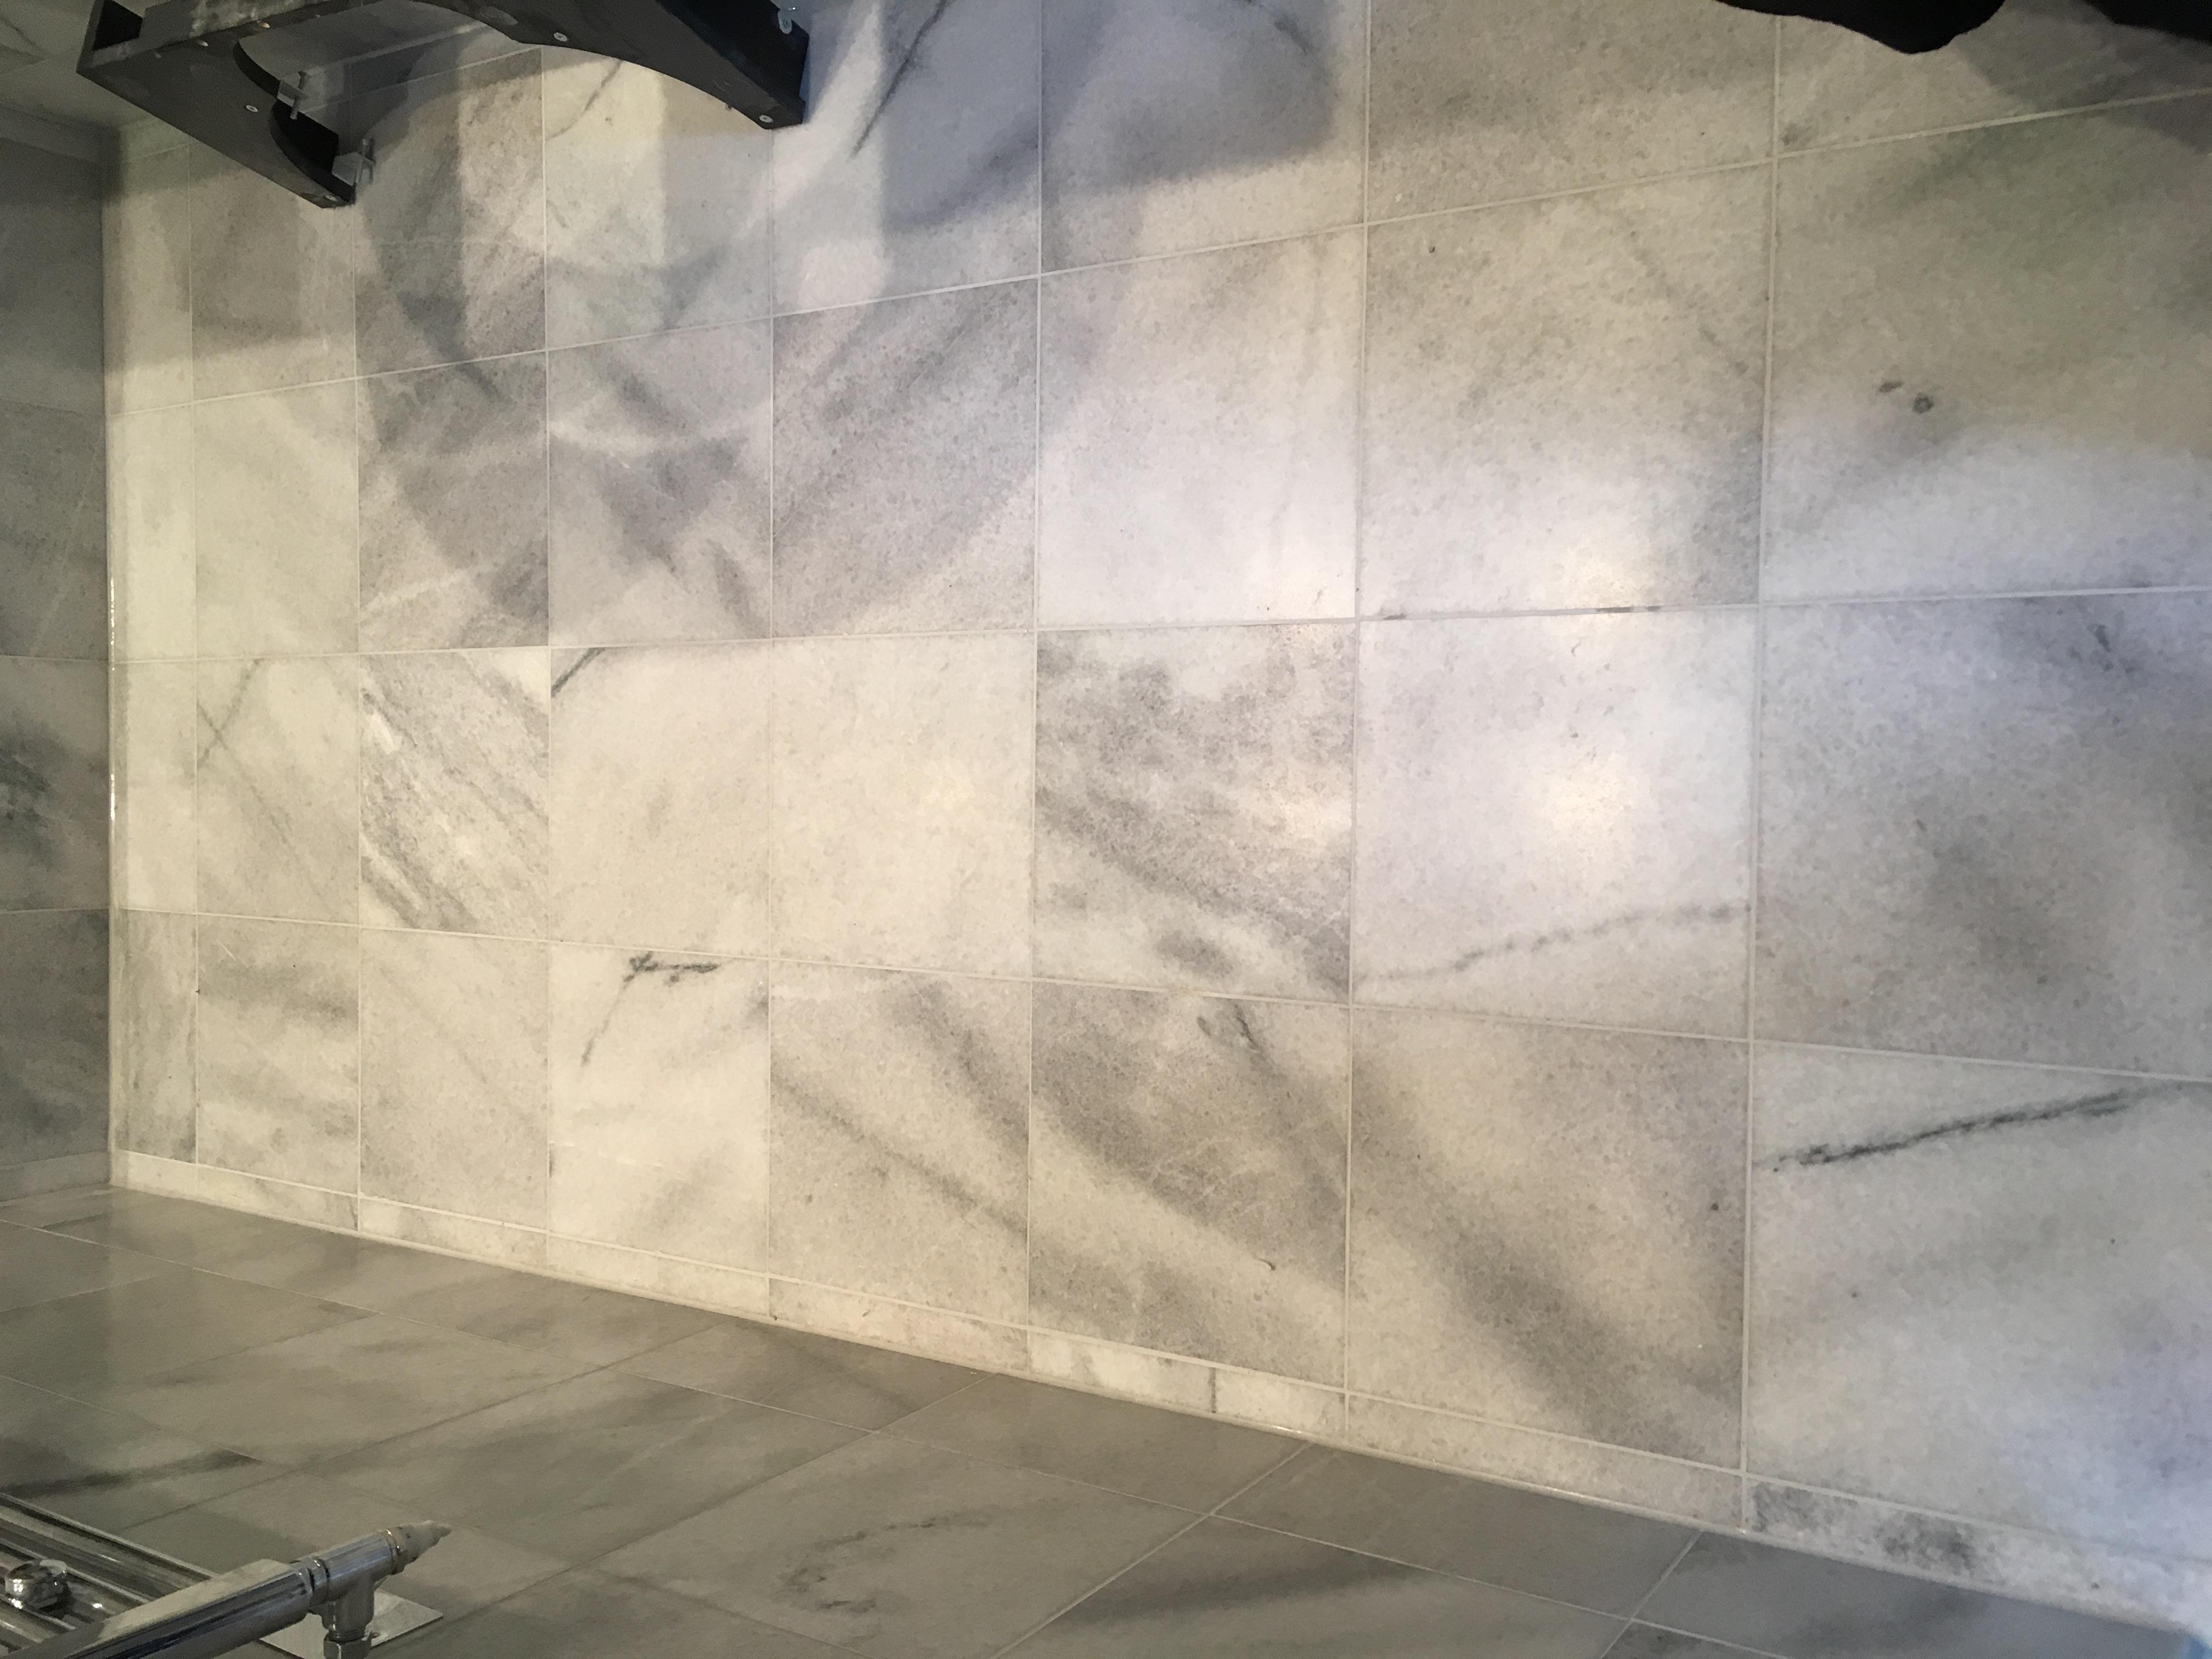 Cristal white marble bathroom tiles (4)